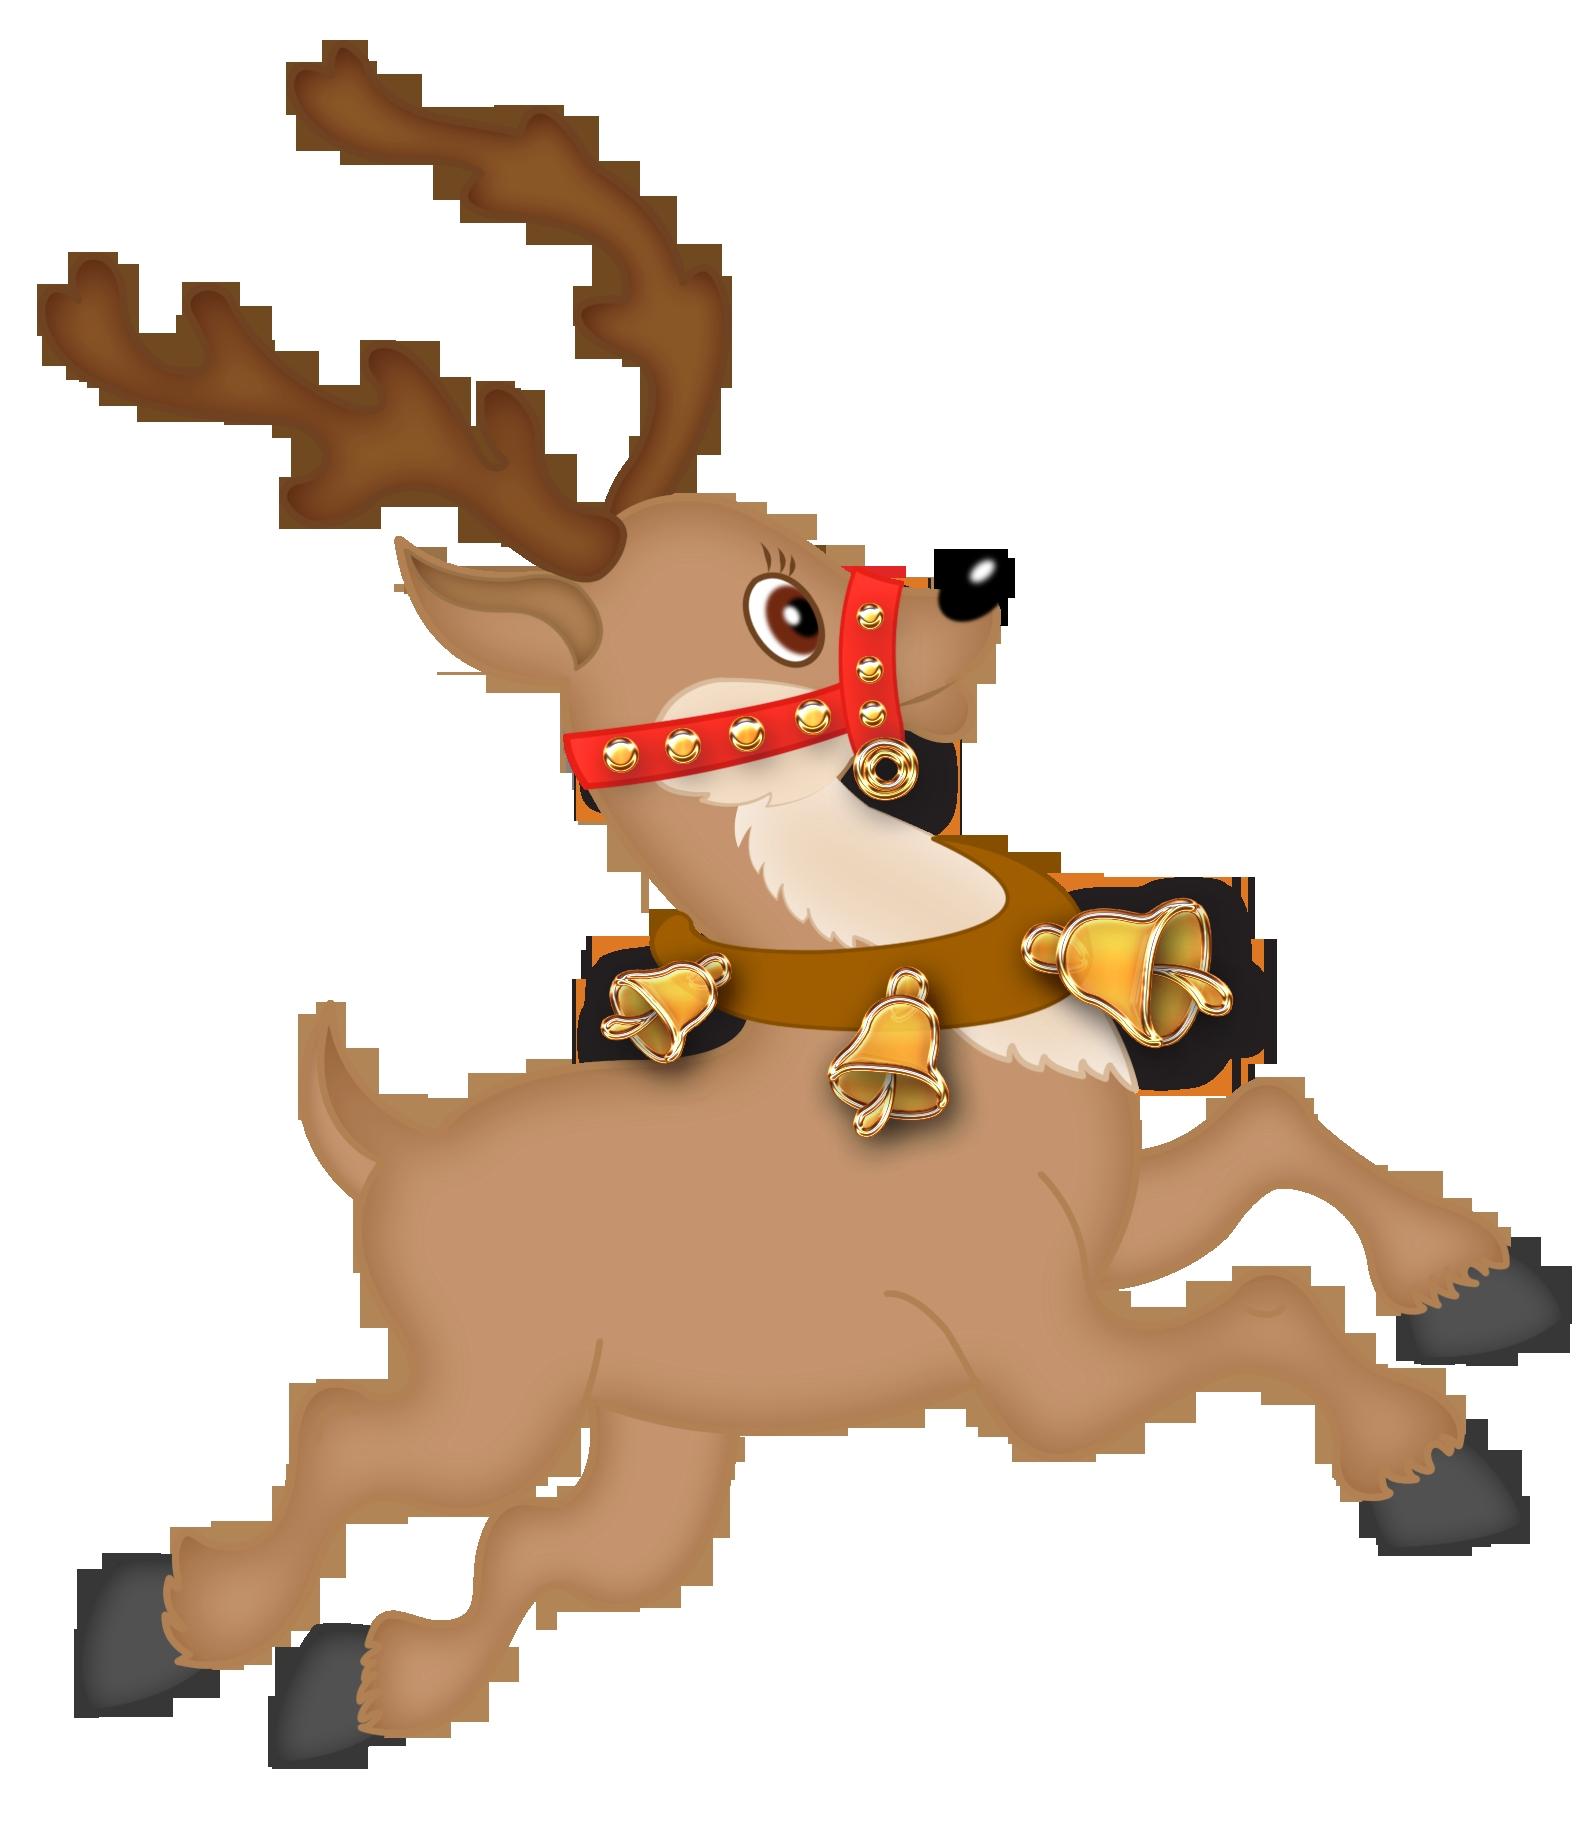 christmas reindeer clipart - 15 - o - Christmas Reindeer Free Download Clip  Art